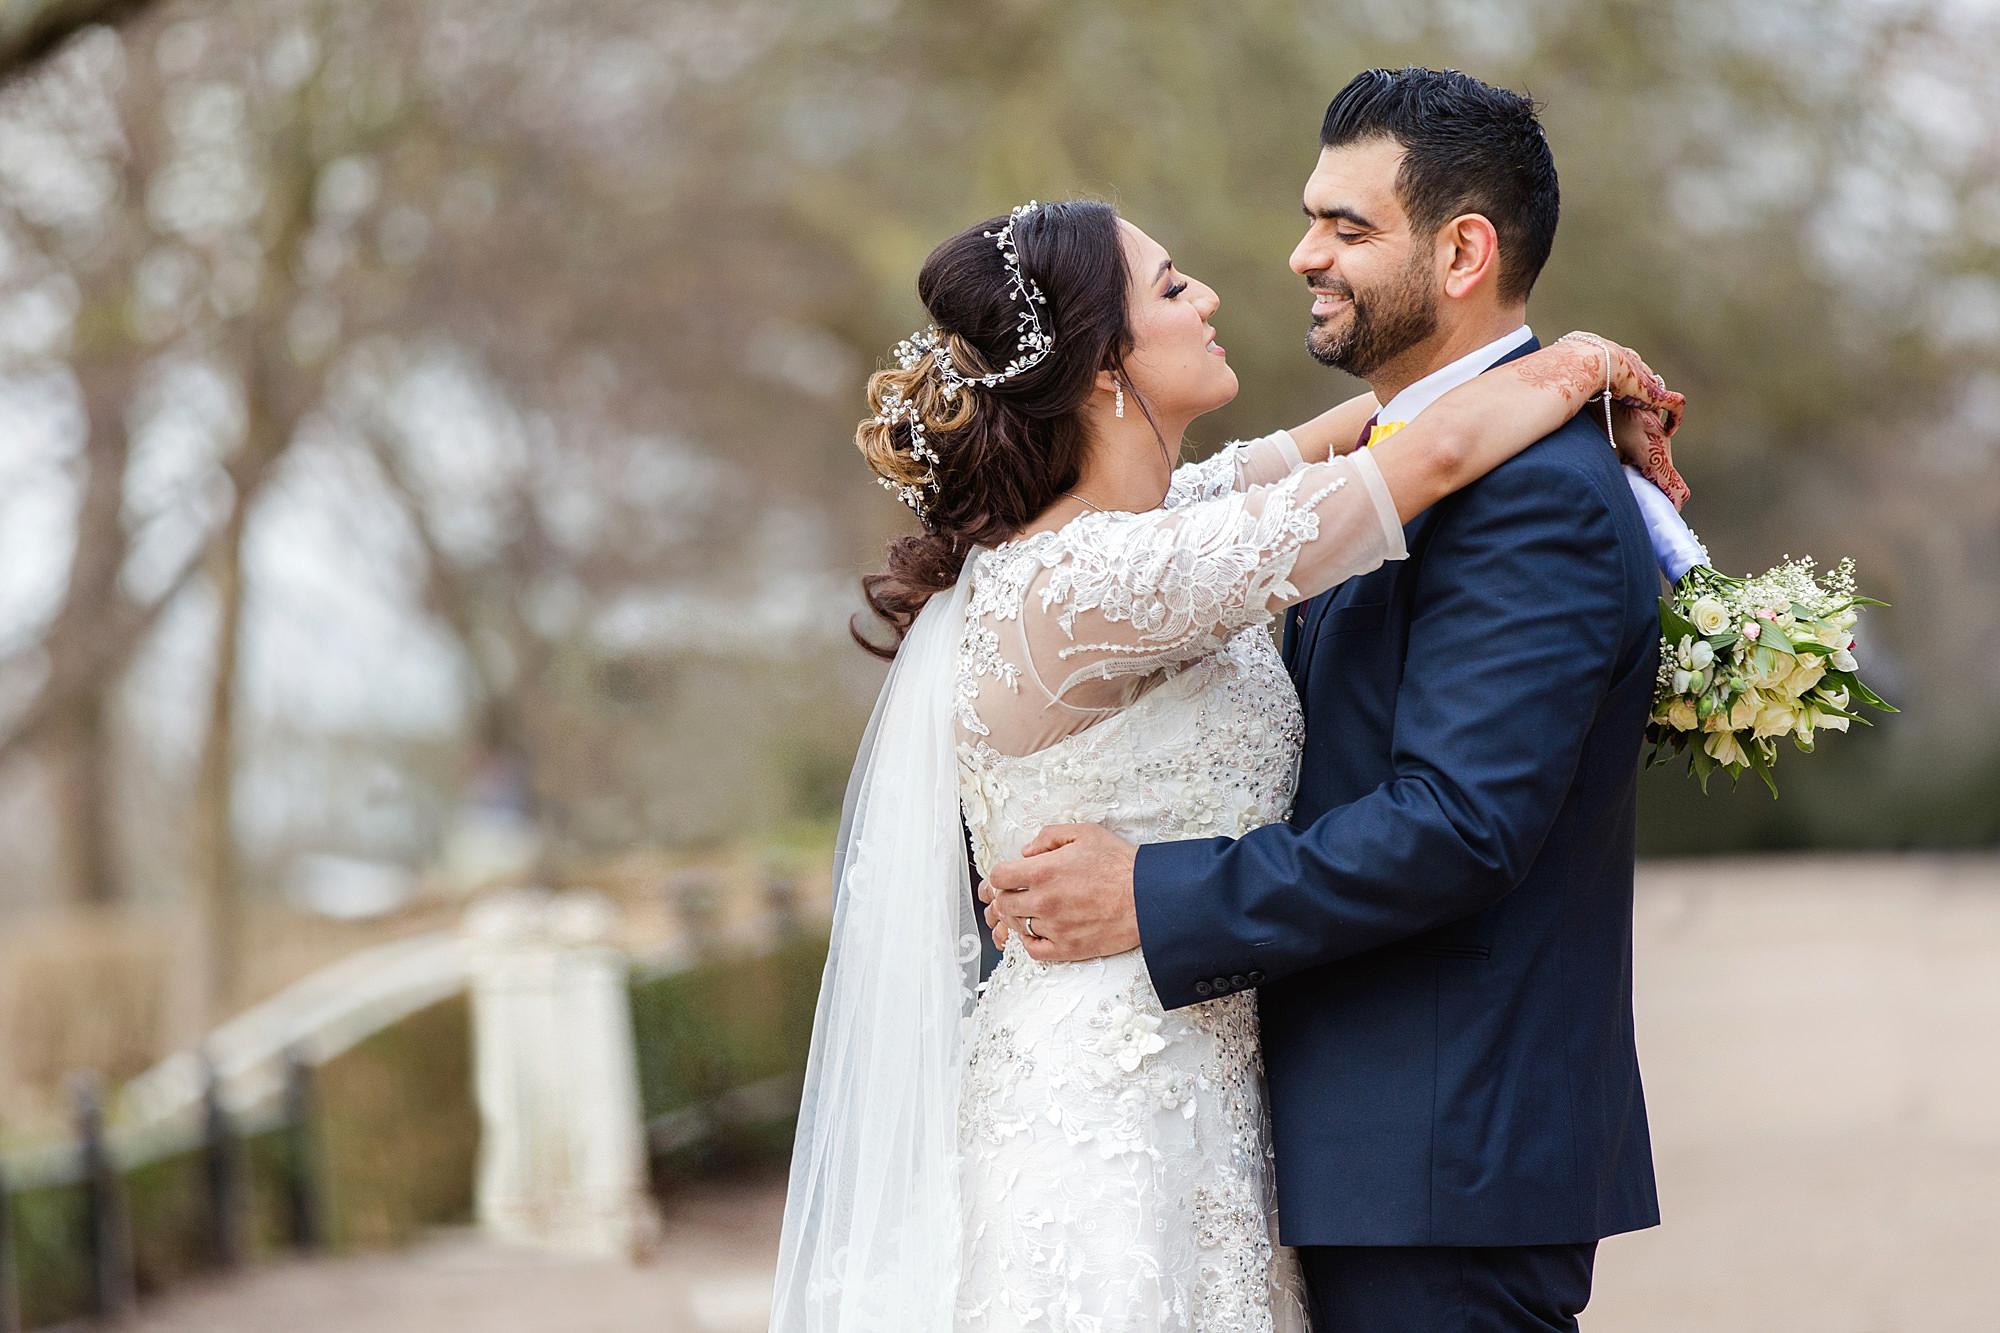 Richmond Hill Hotel wedding photography bride and groom hug on richmond hill terrace